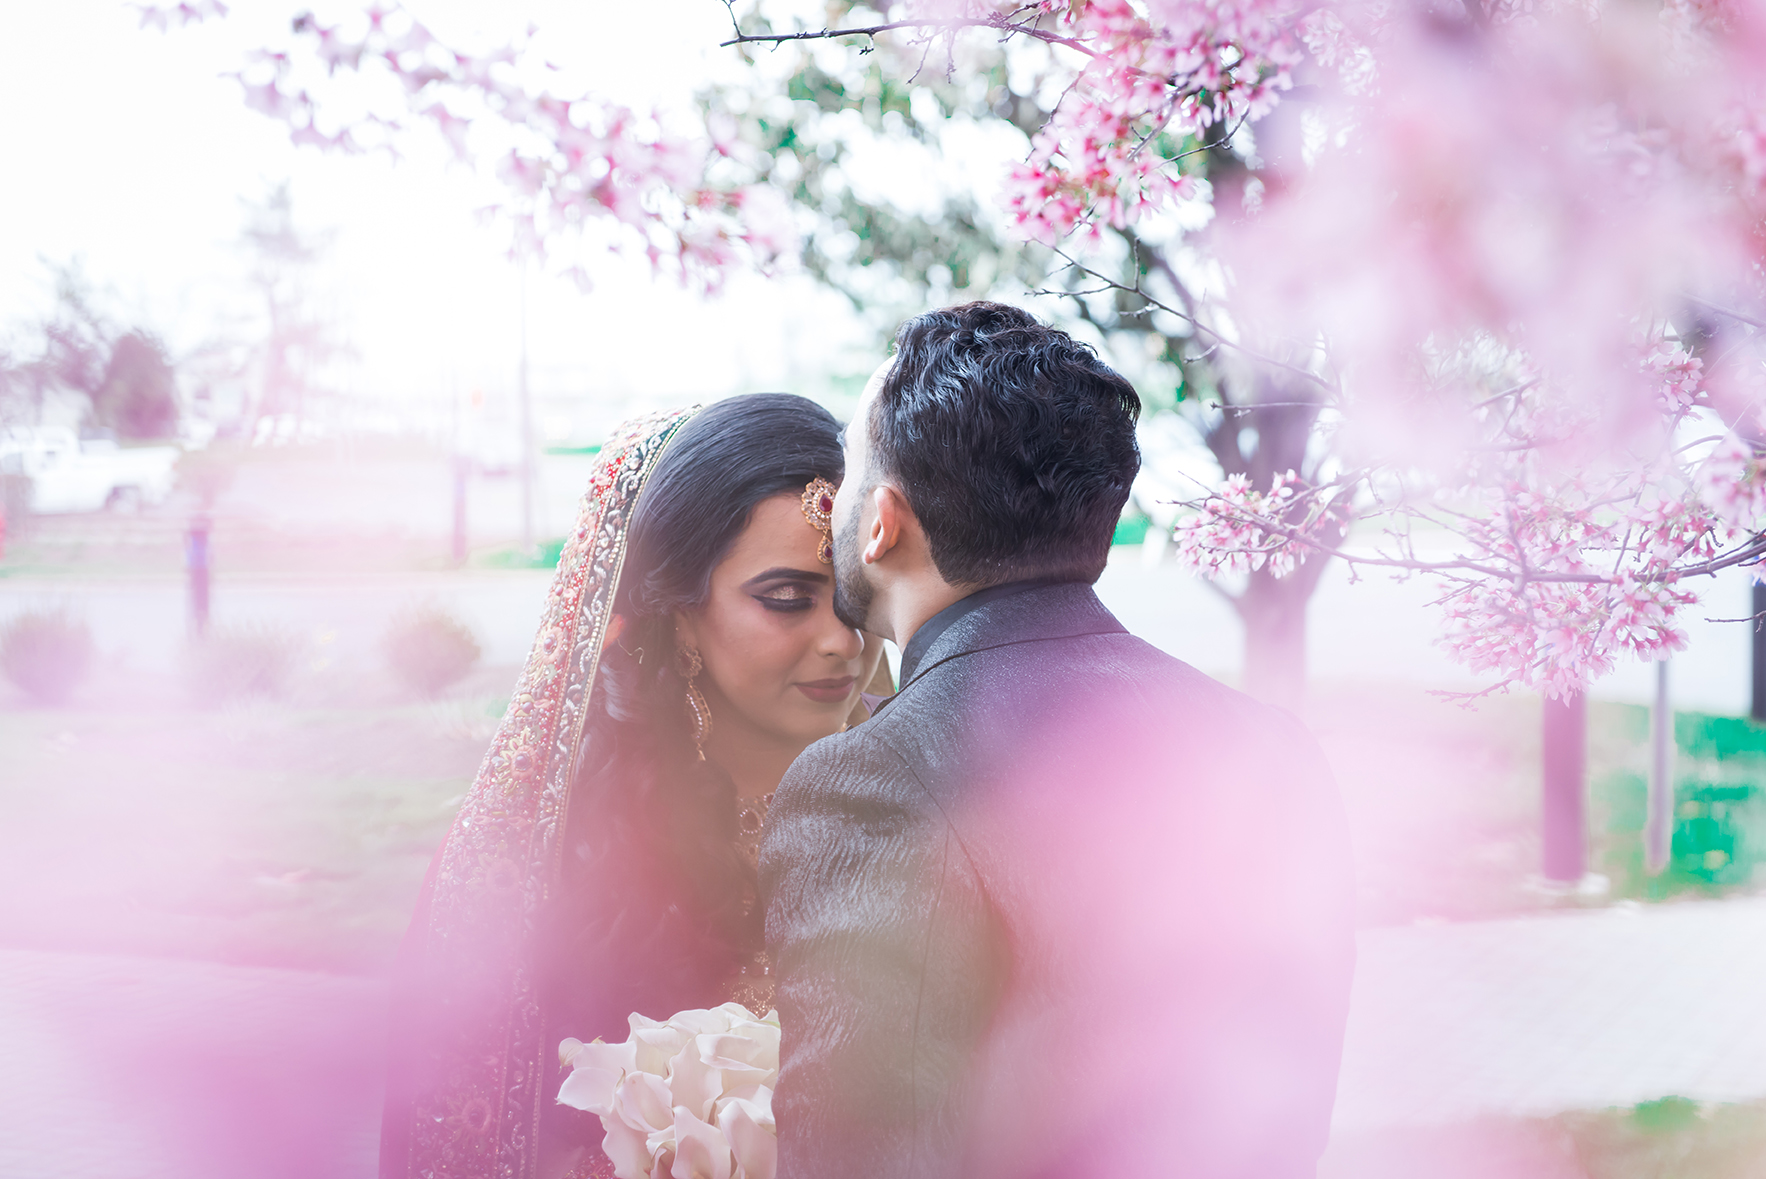 south_asian_wedding_photography_dhoom_studio_new_york47 SOUTH ASIAN WEDDINGS